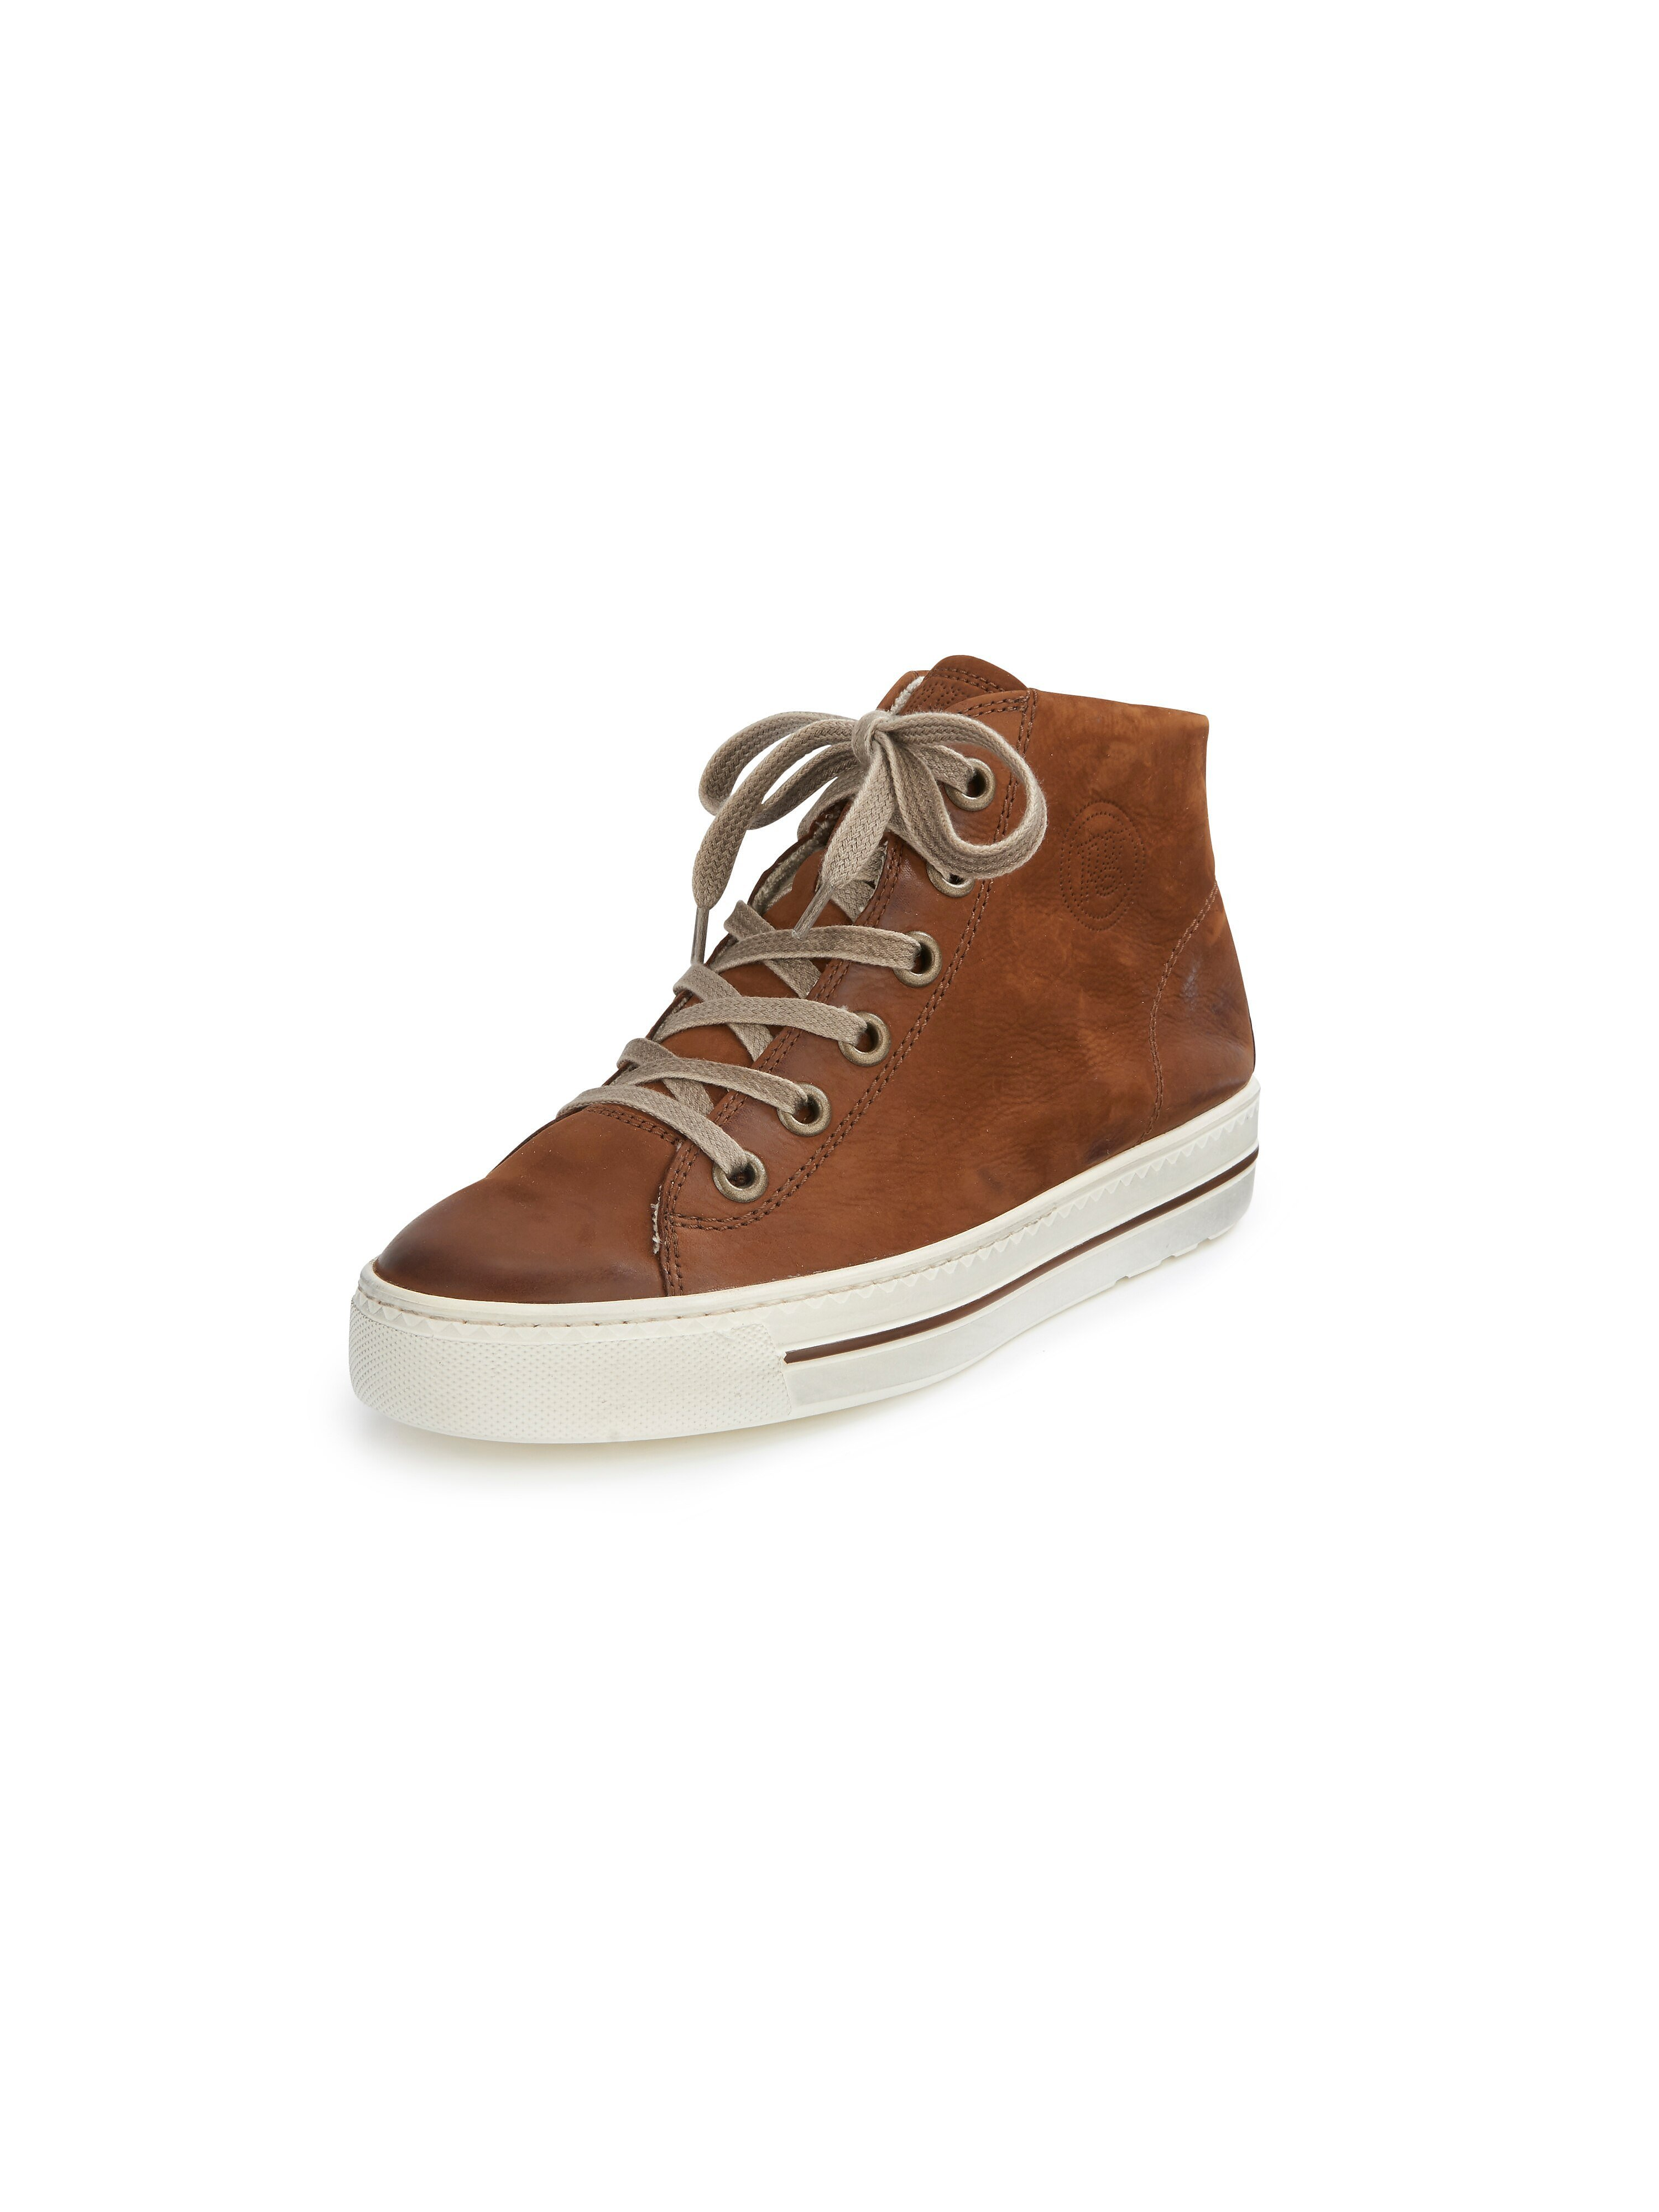 Sneakers Van Paul Green bruin